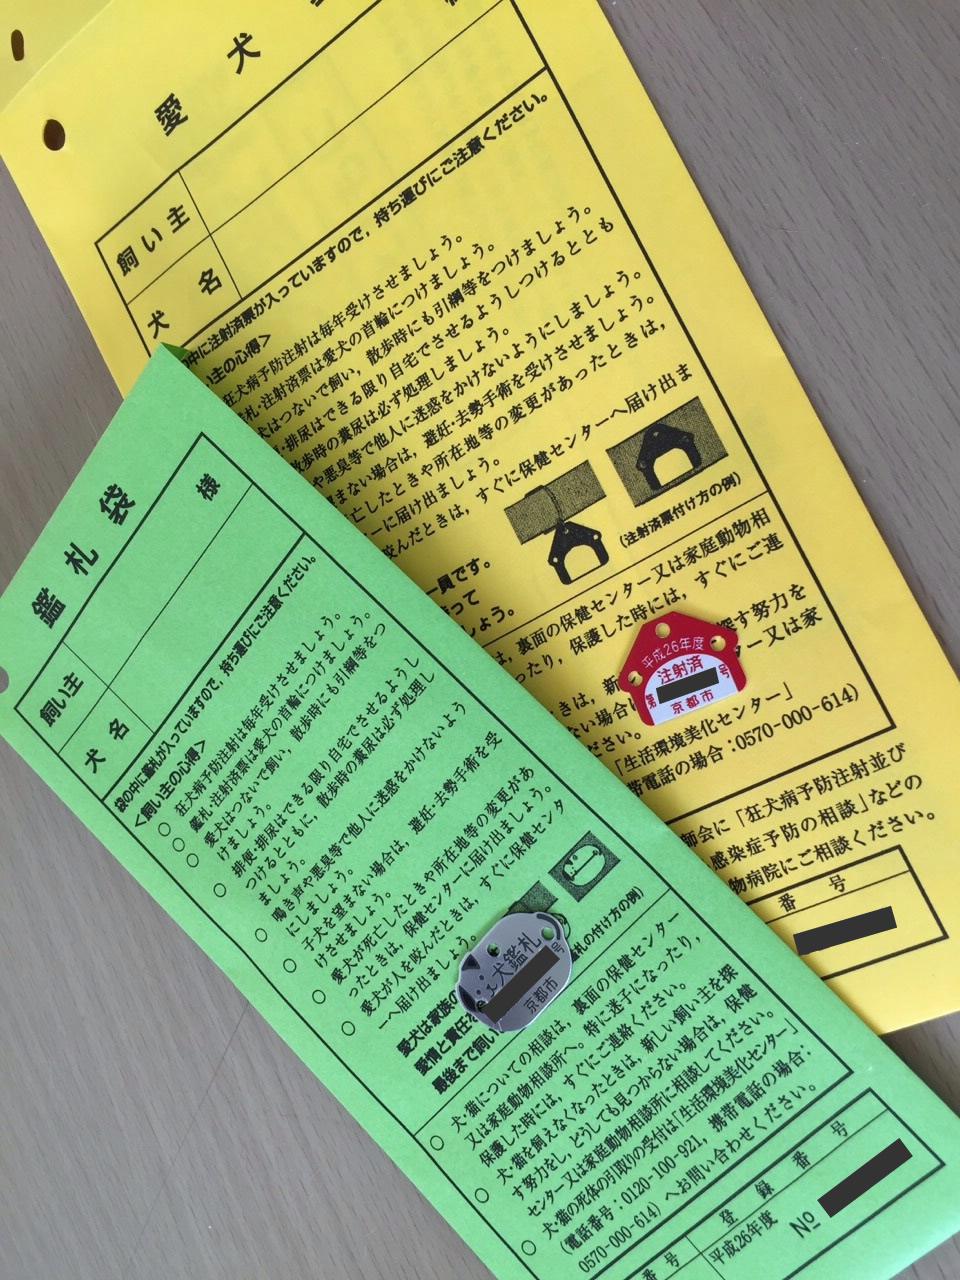 狂犬病鑑札、済票の写真